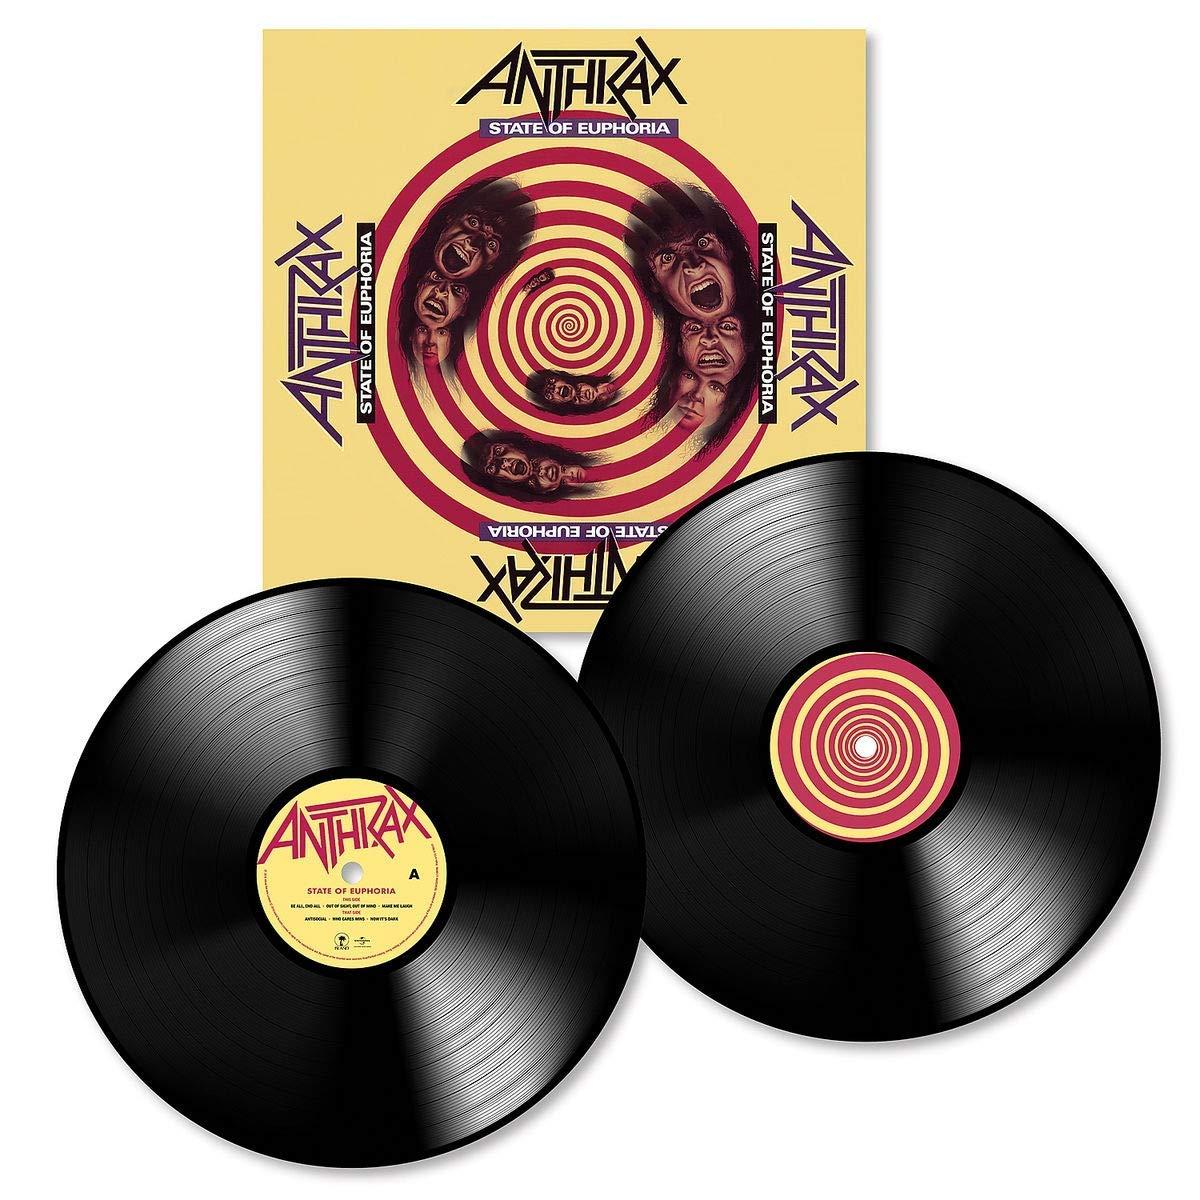 Anthrax Anthrax. State Of Euphoria (2 LP) anthrax – state of euphoria